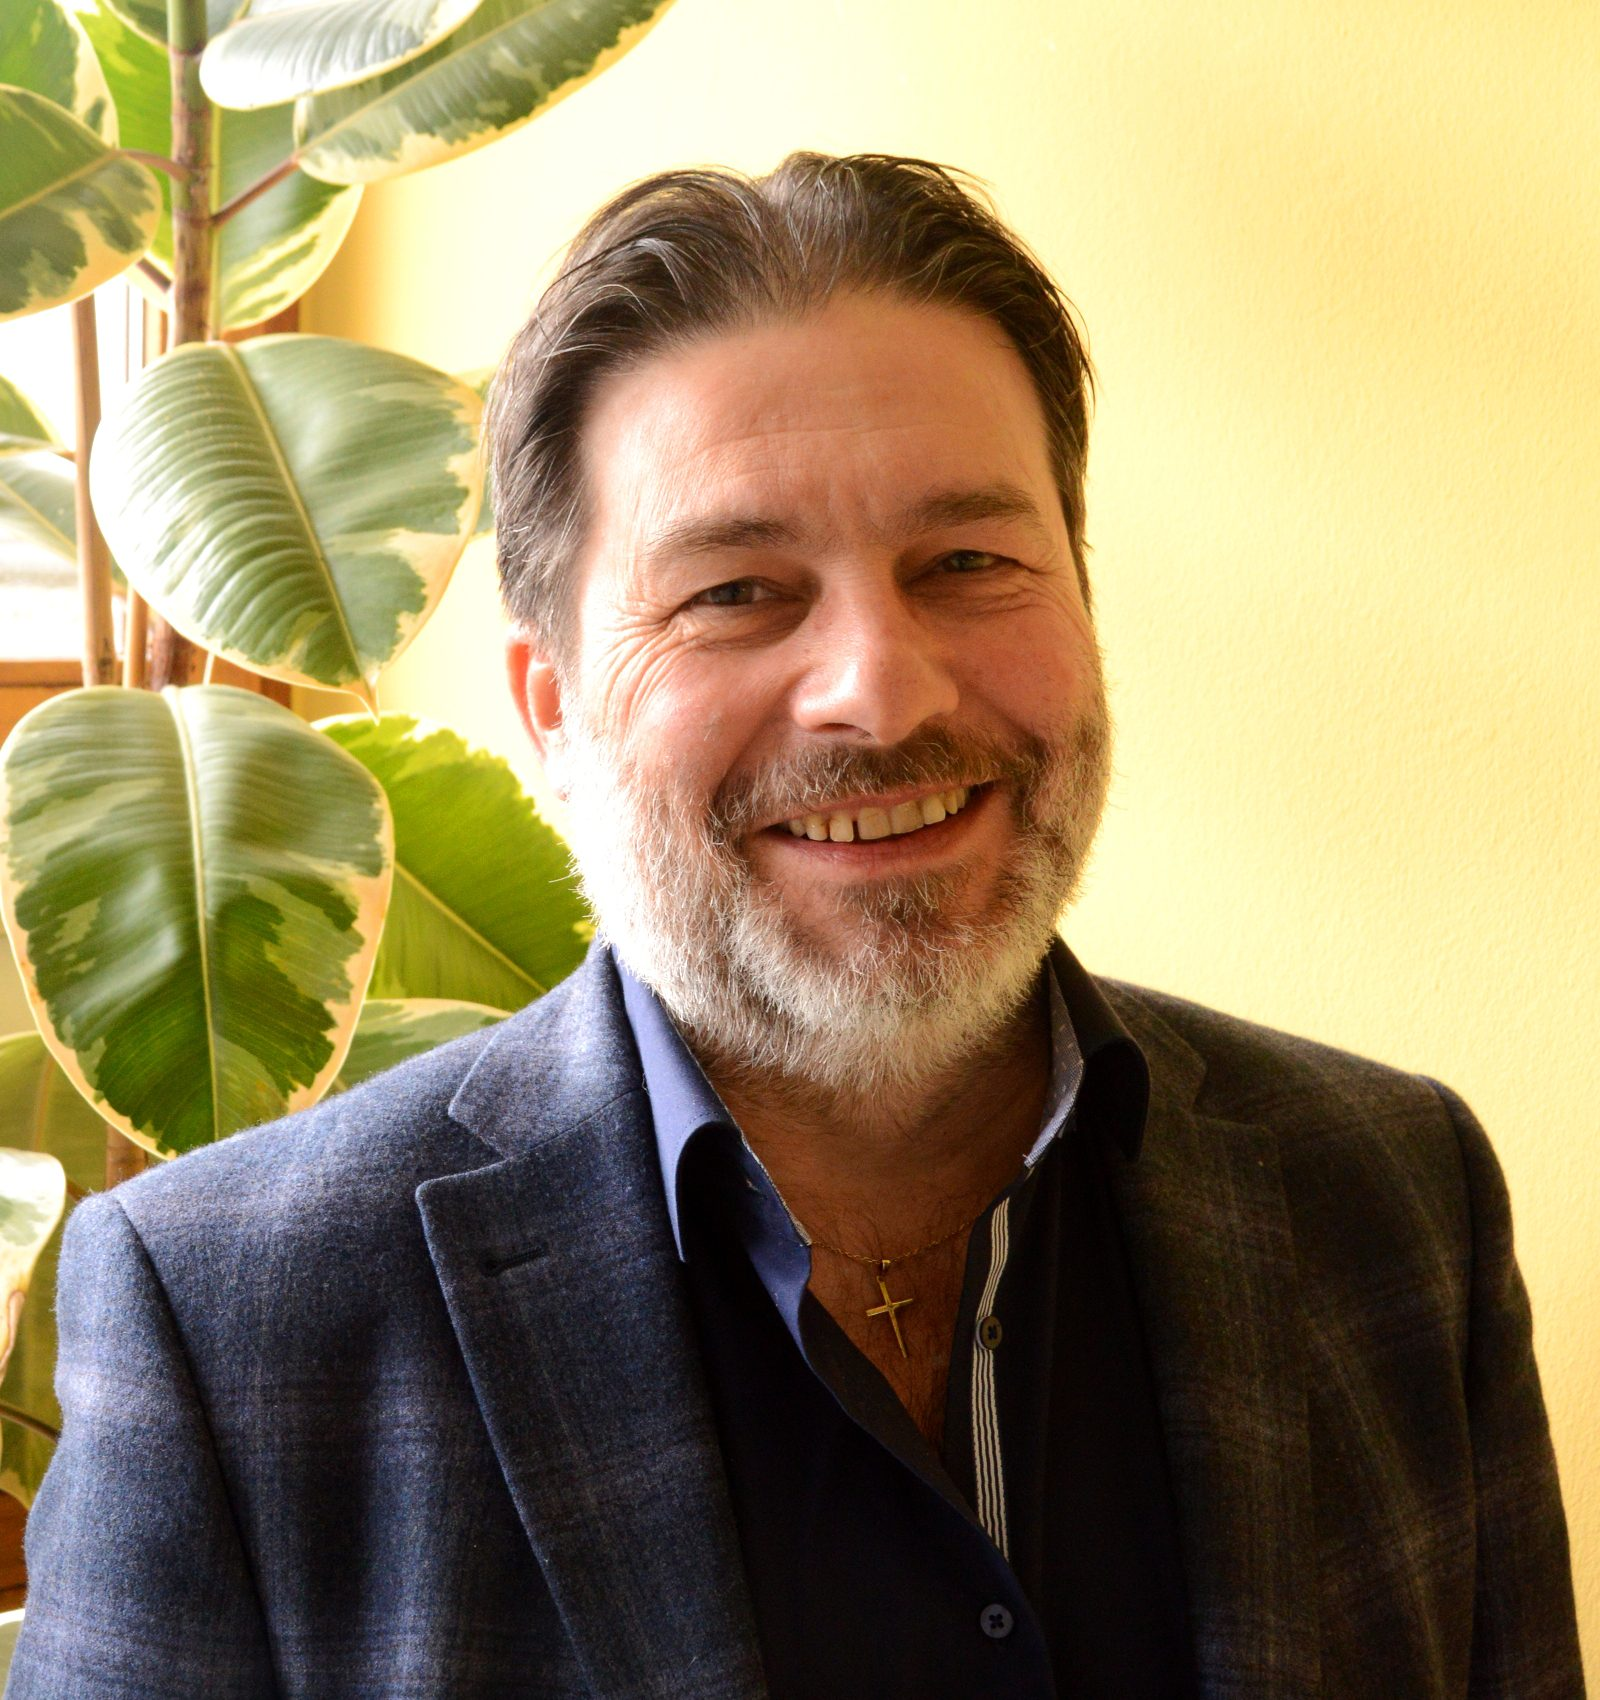 Rainer Heinzle